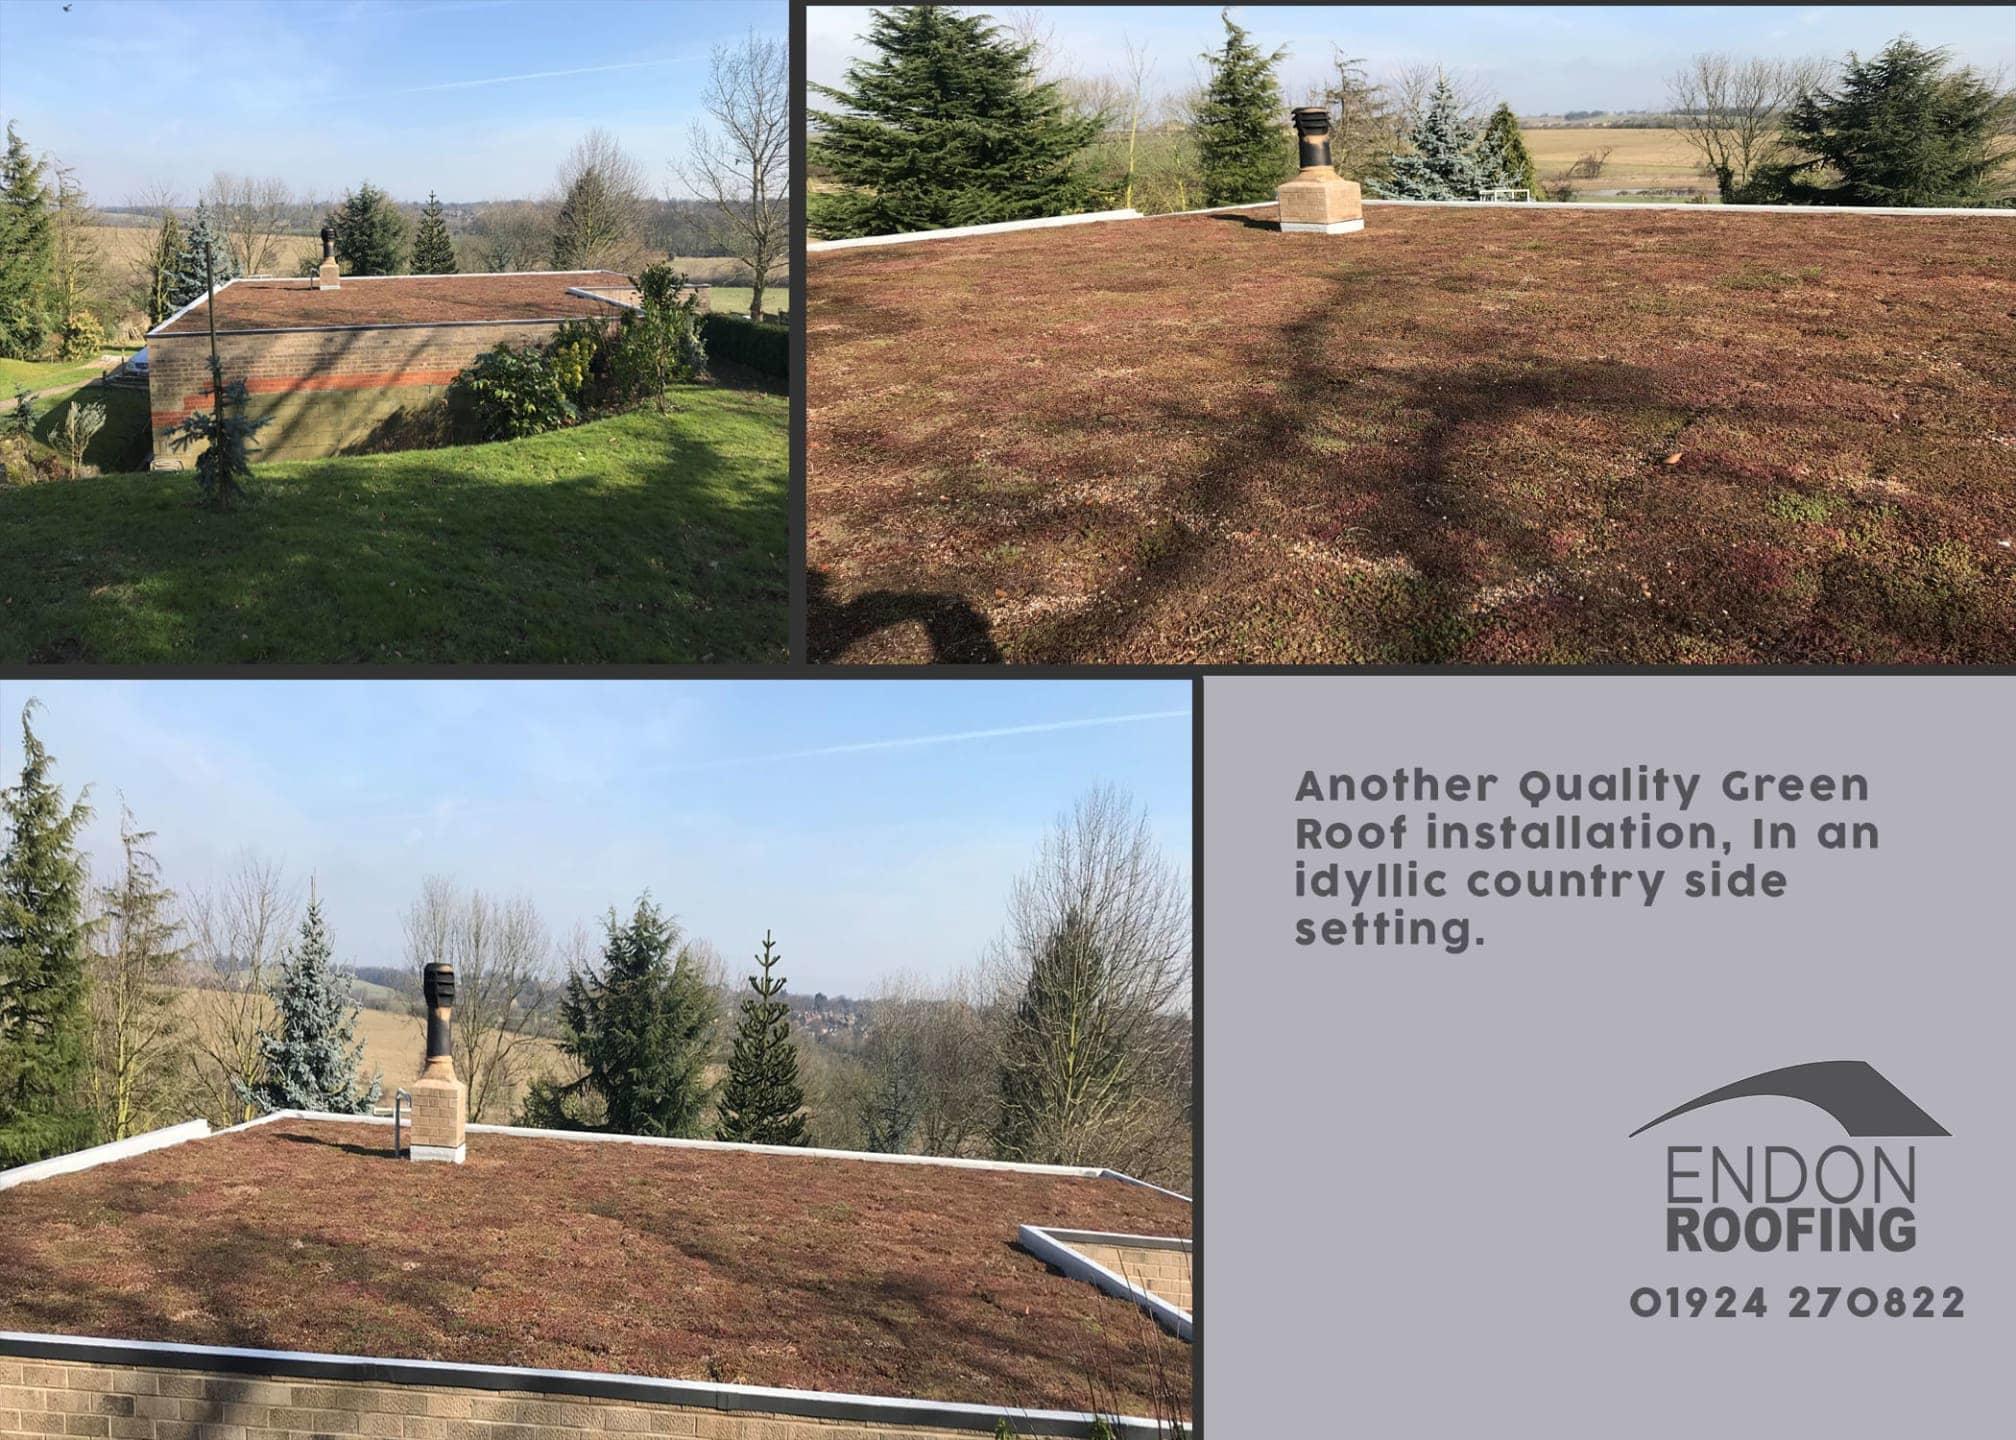 Construction Repair And Arrangement Roofing In Ossett